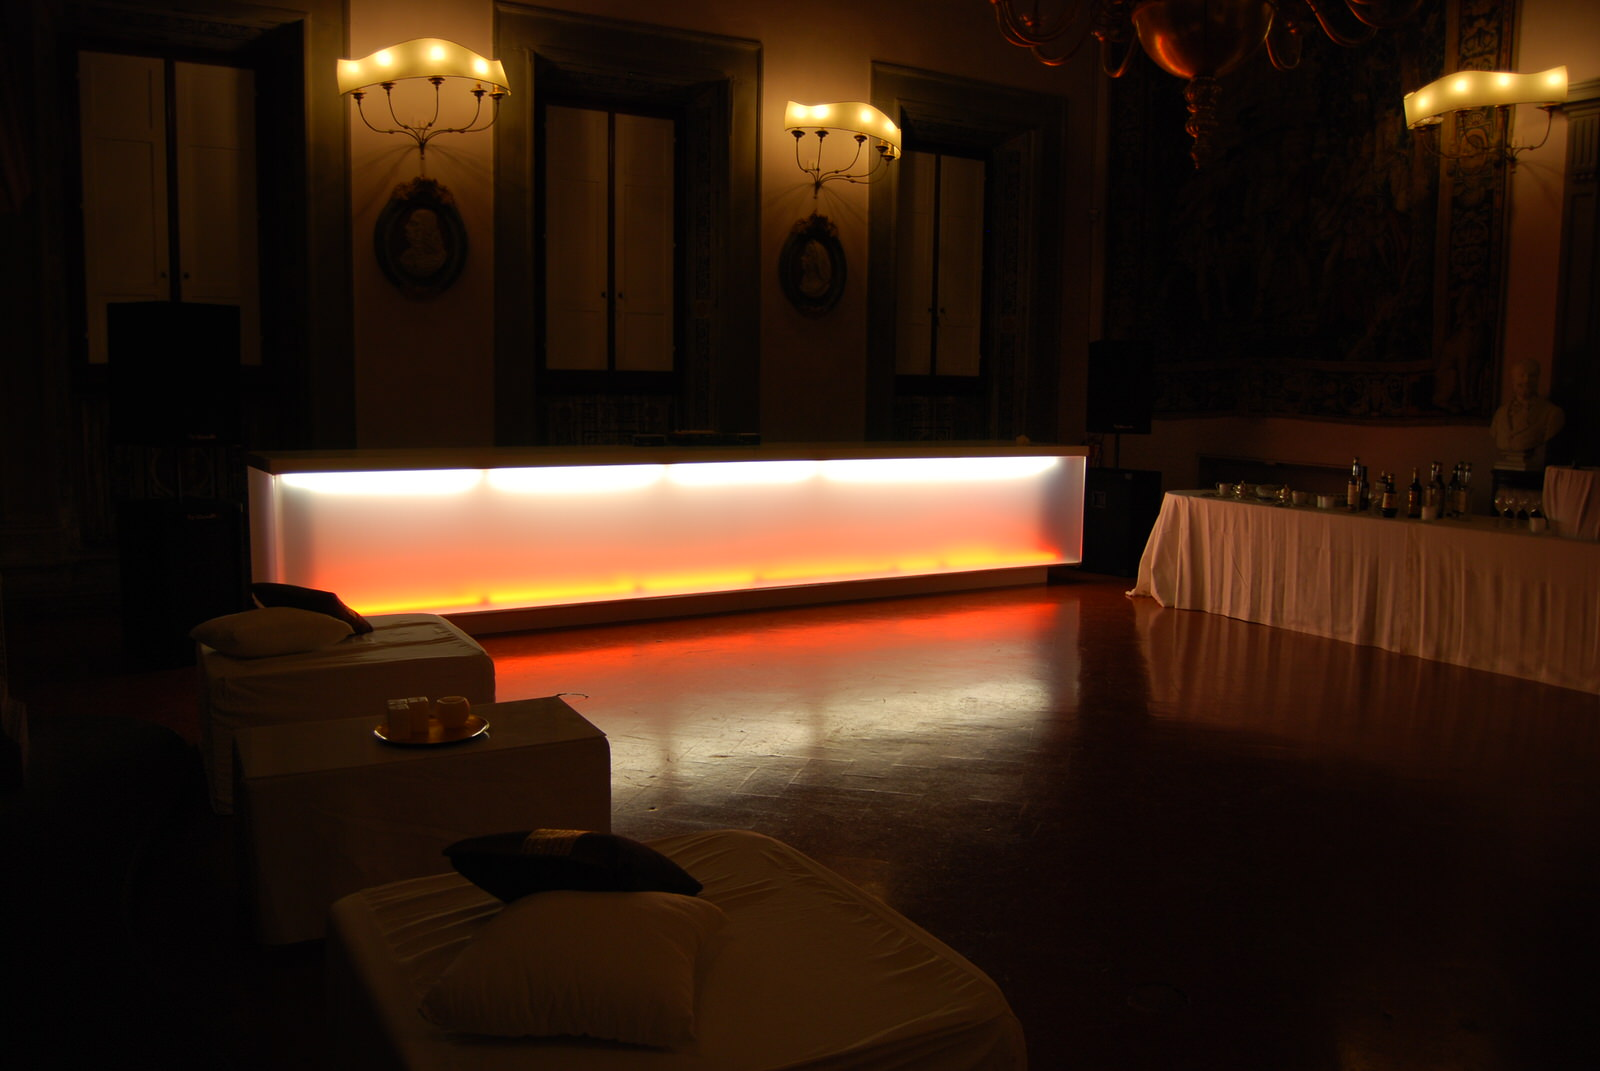 tuscany-wedding-planners-lightsound-06.jpg